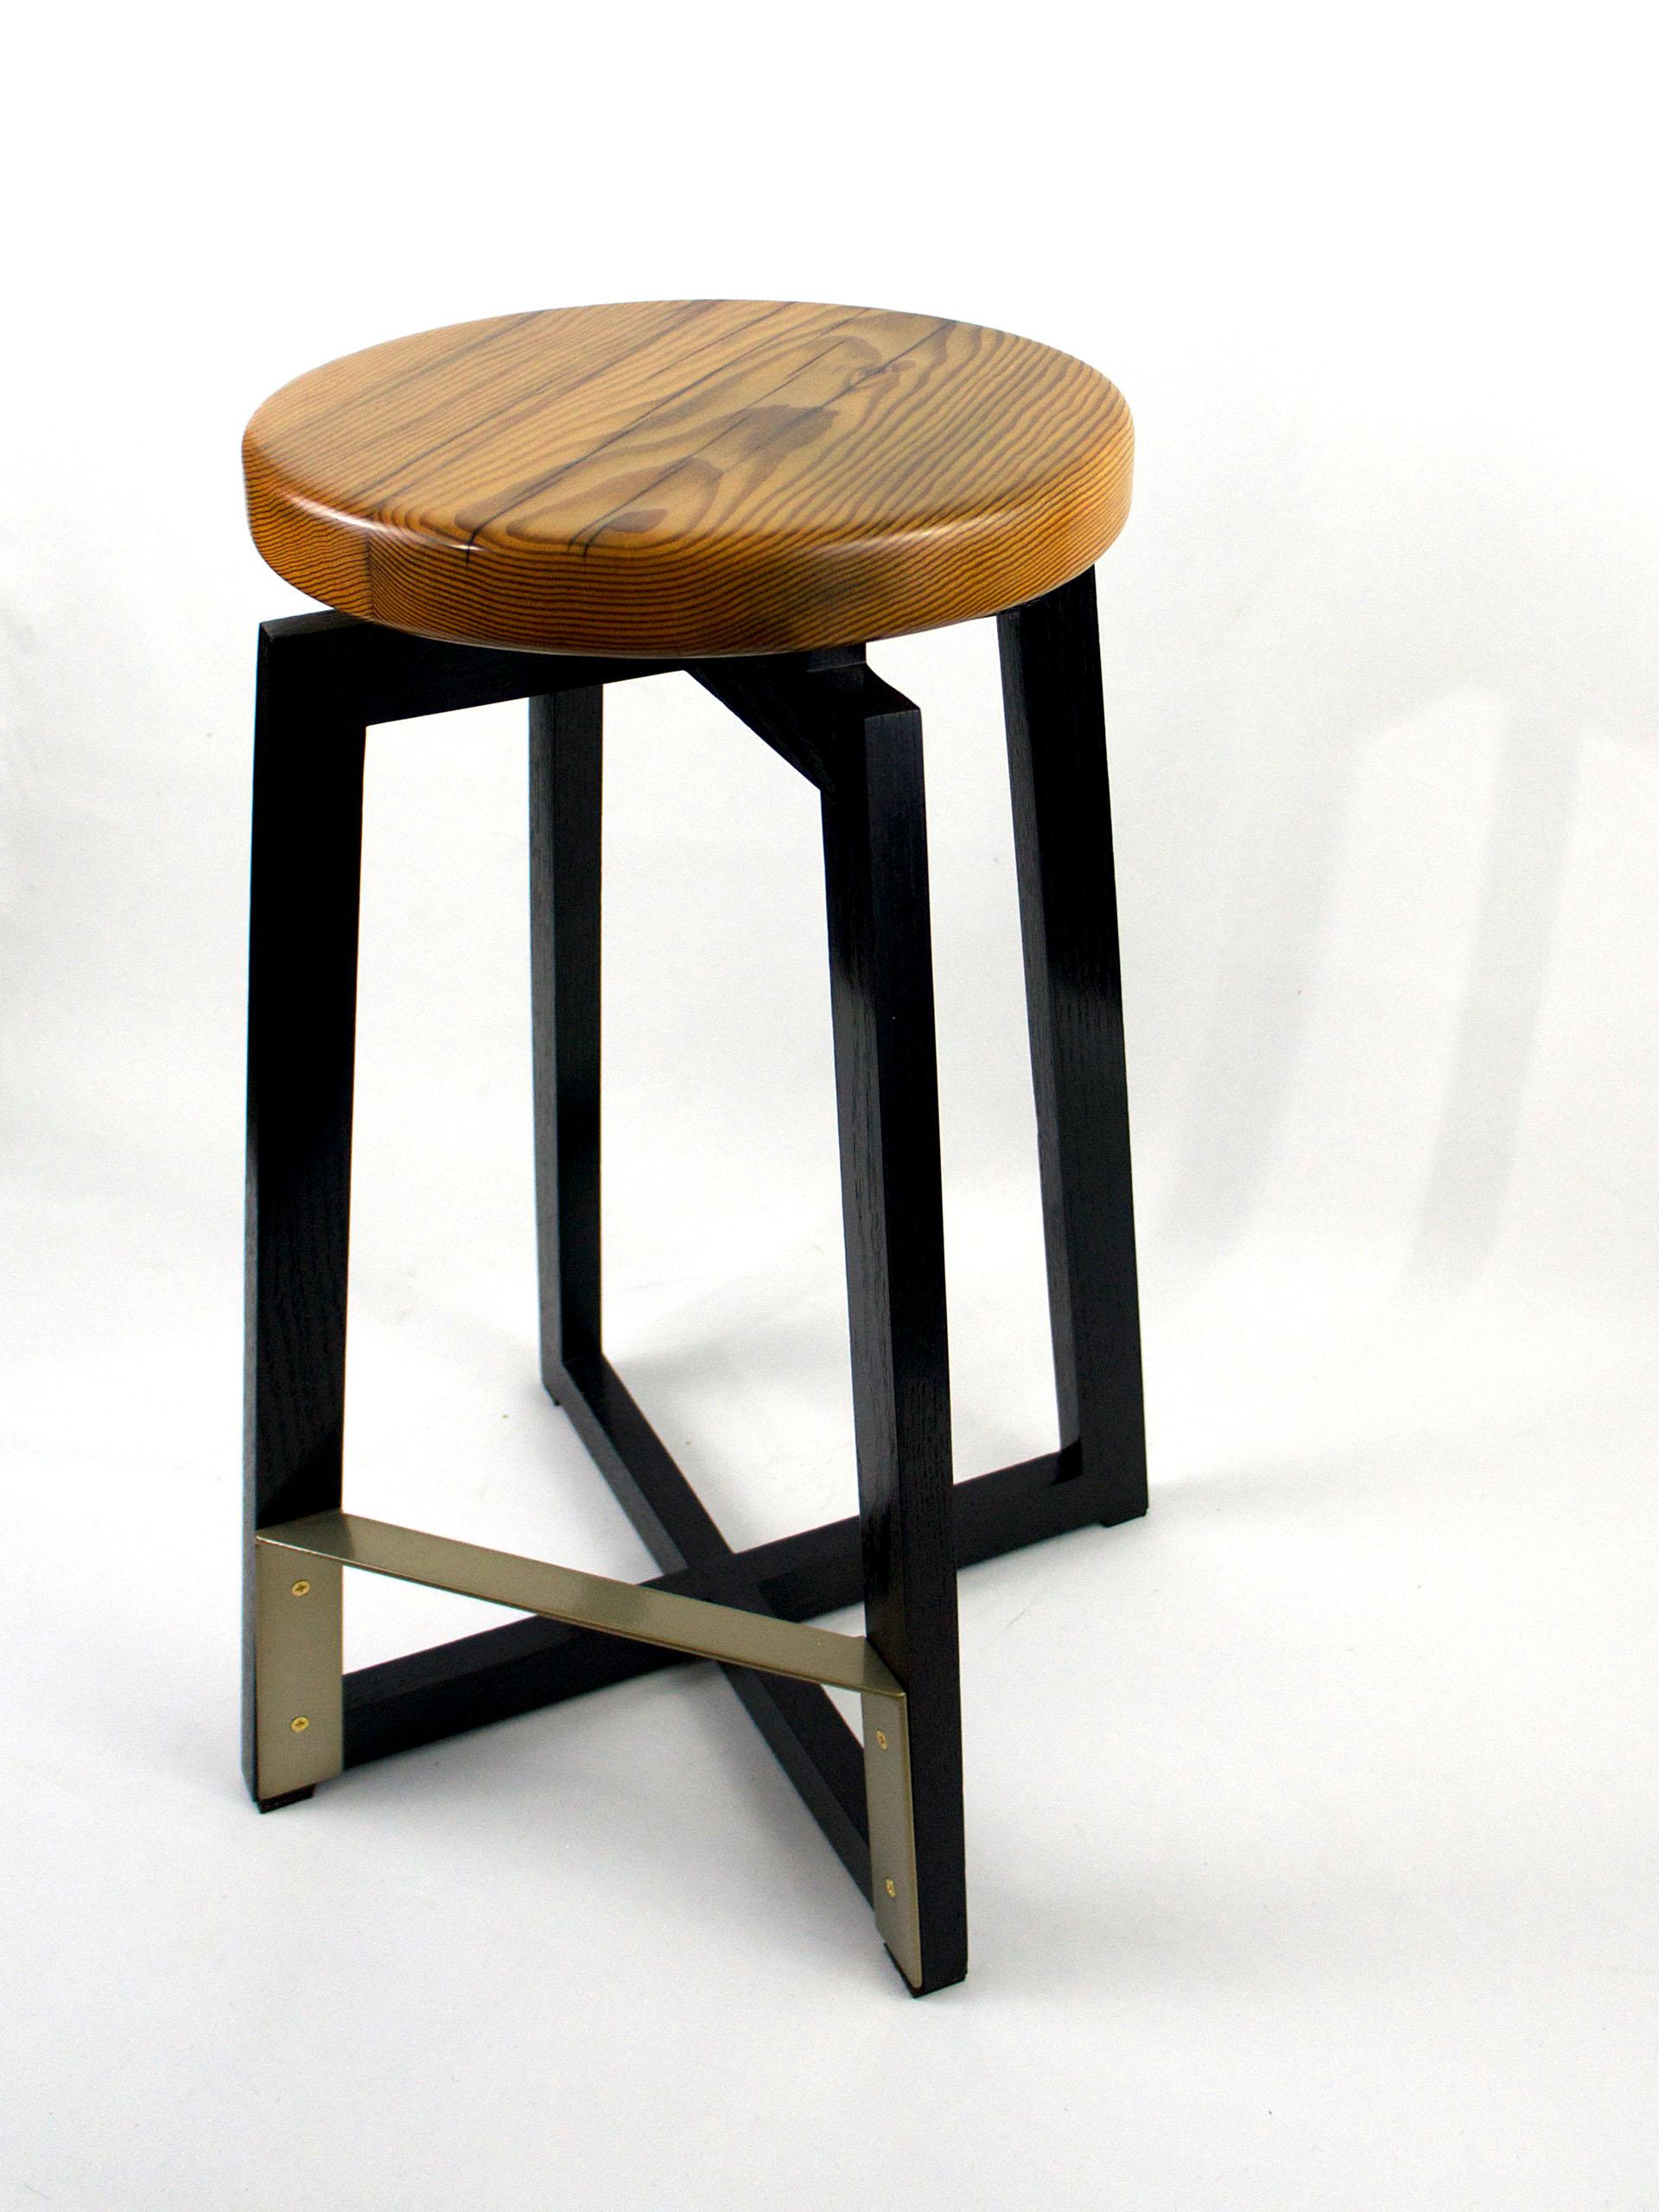 Picke wood stool 2.jpg